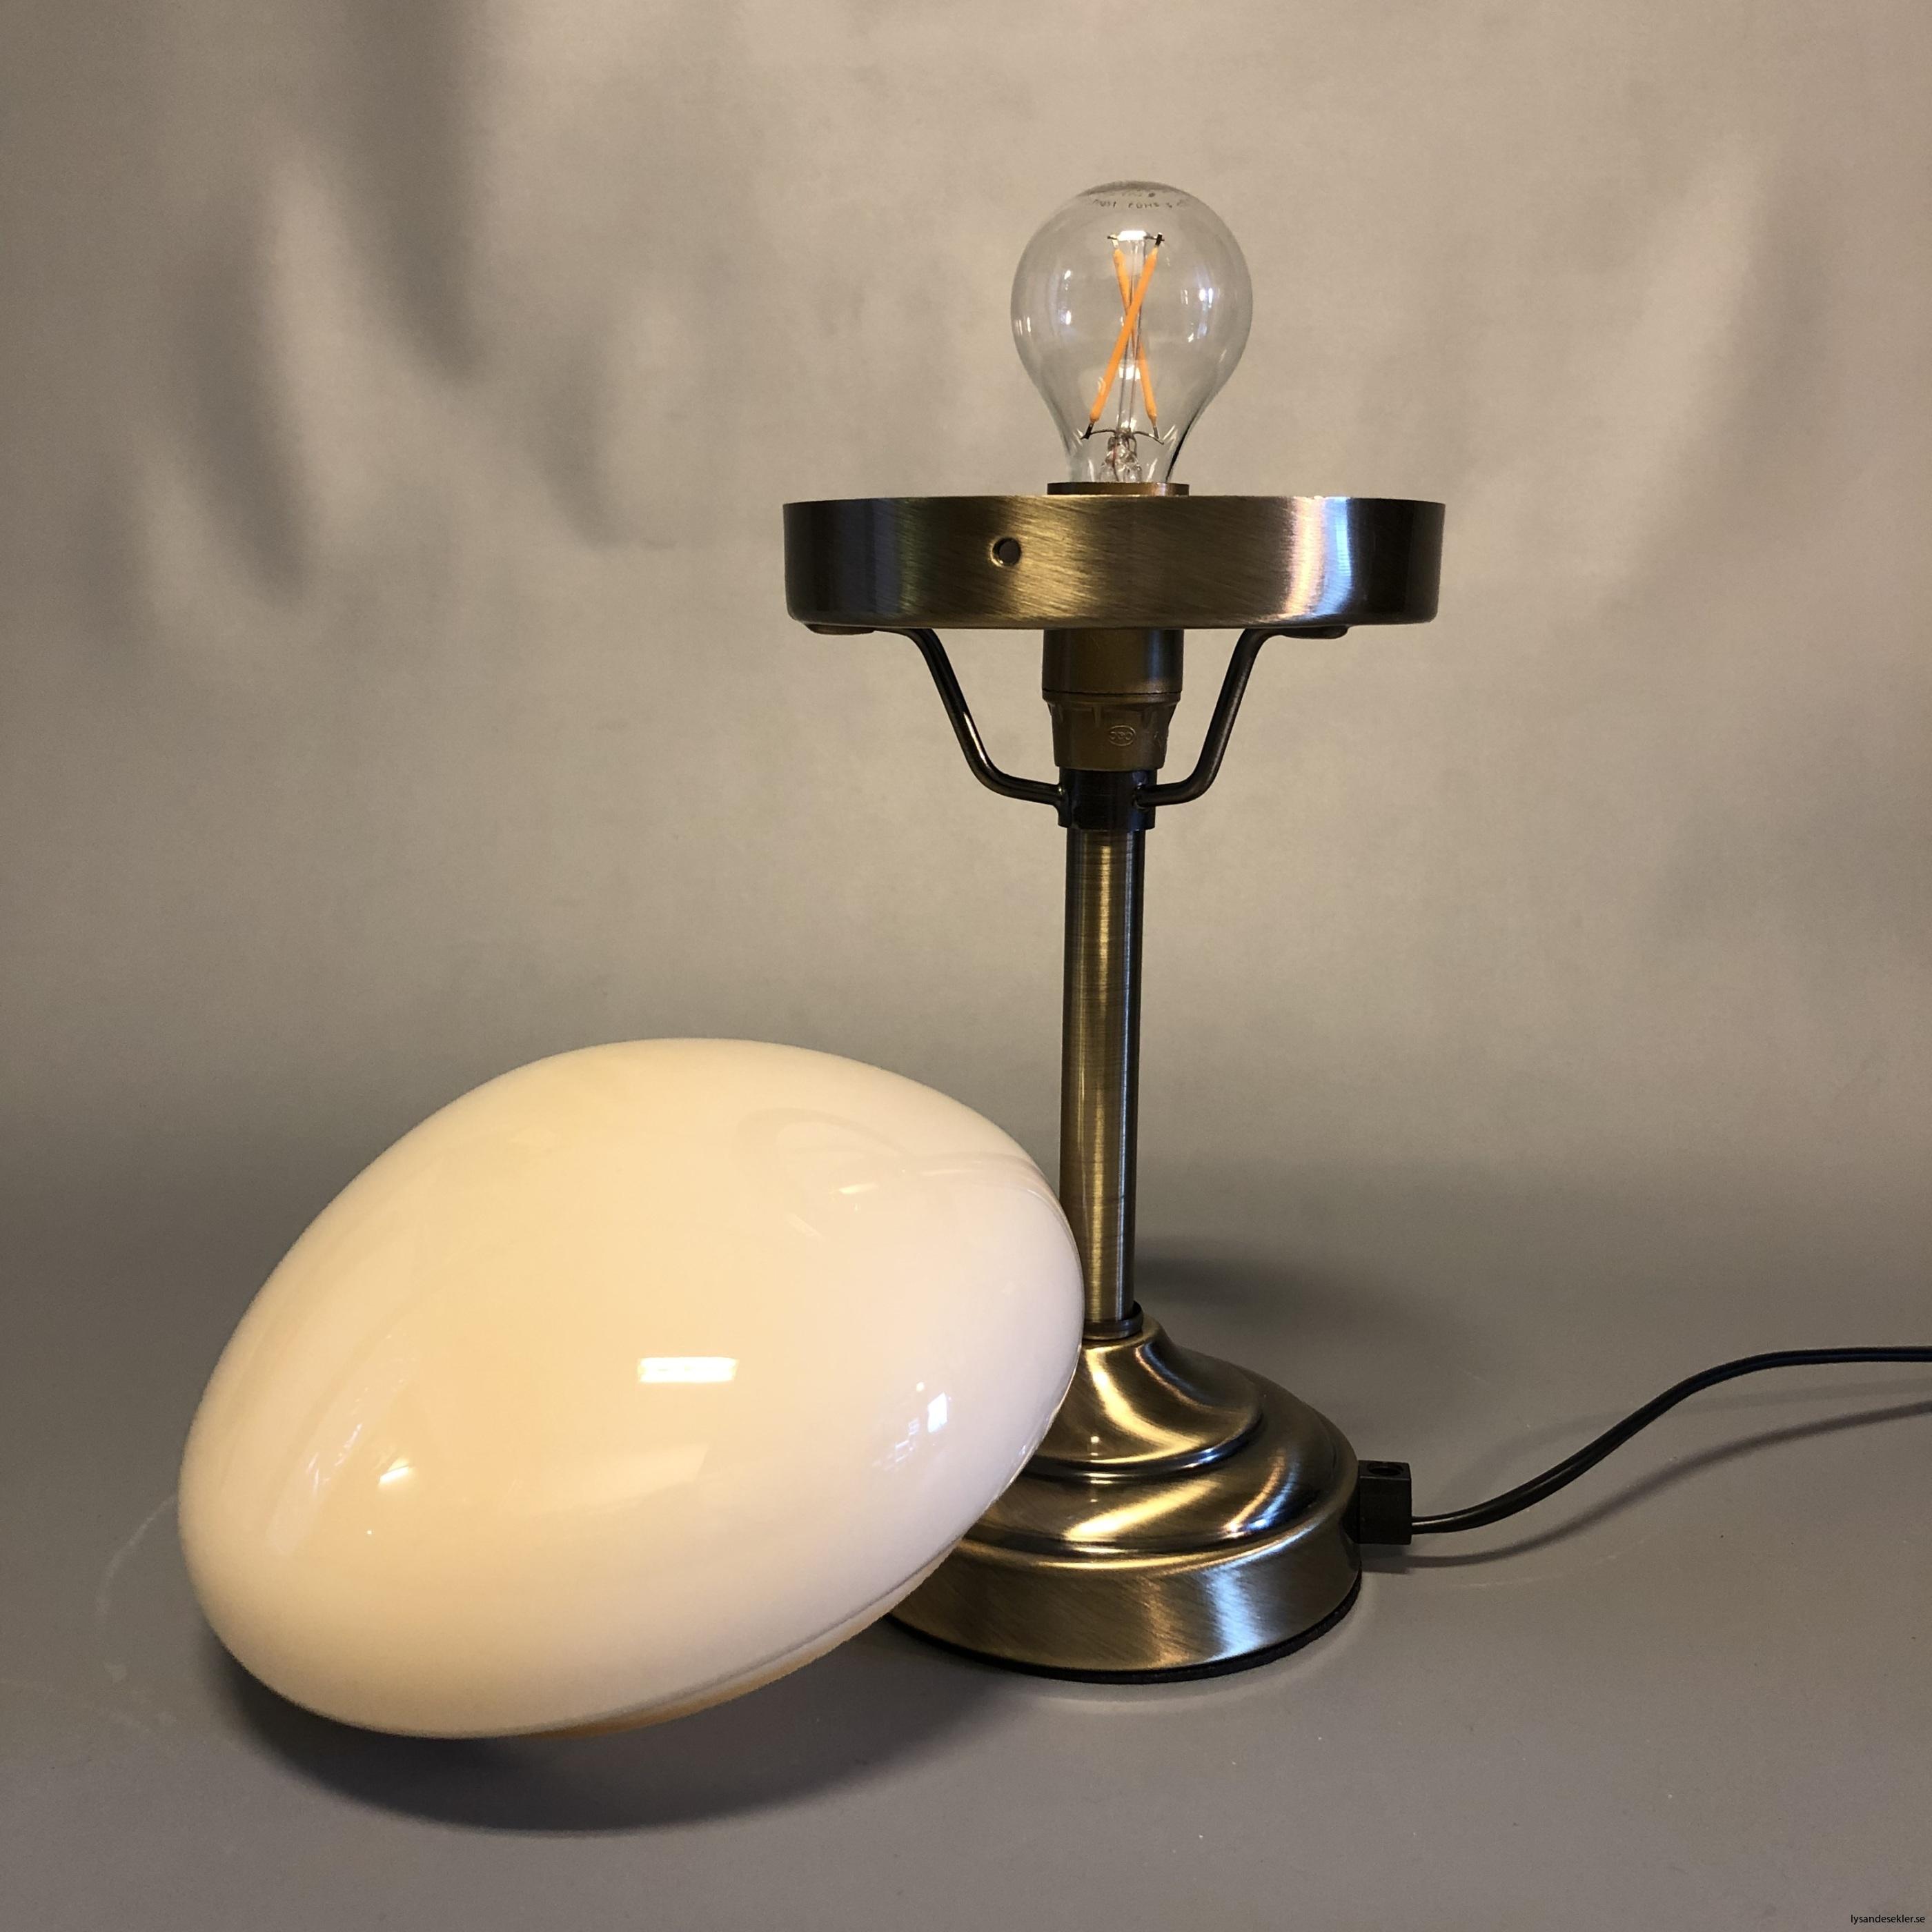 liten strindbergslampa 12 cm skärm8